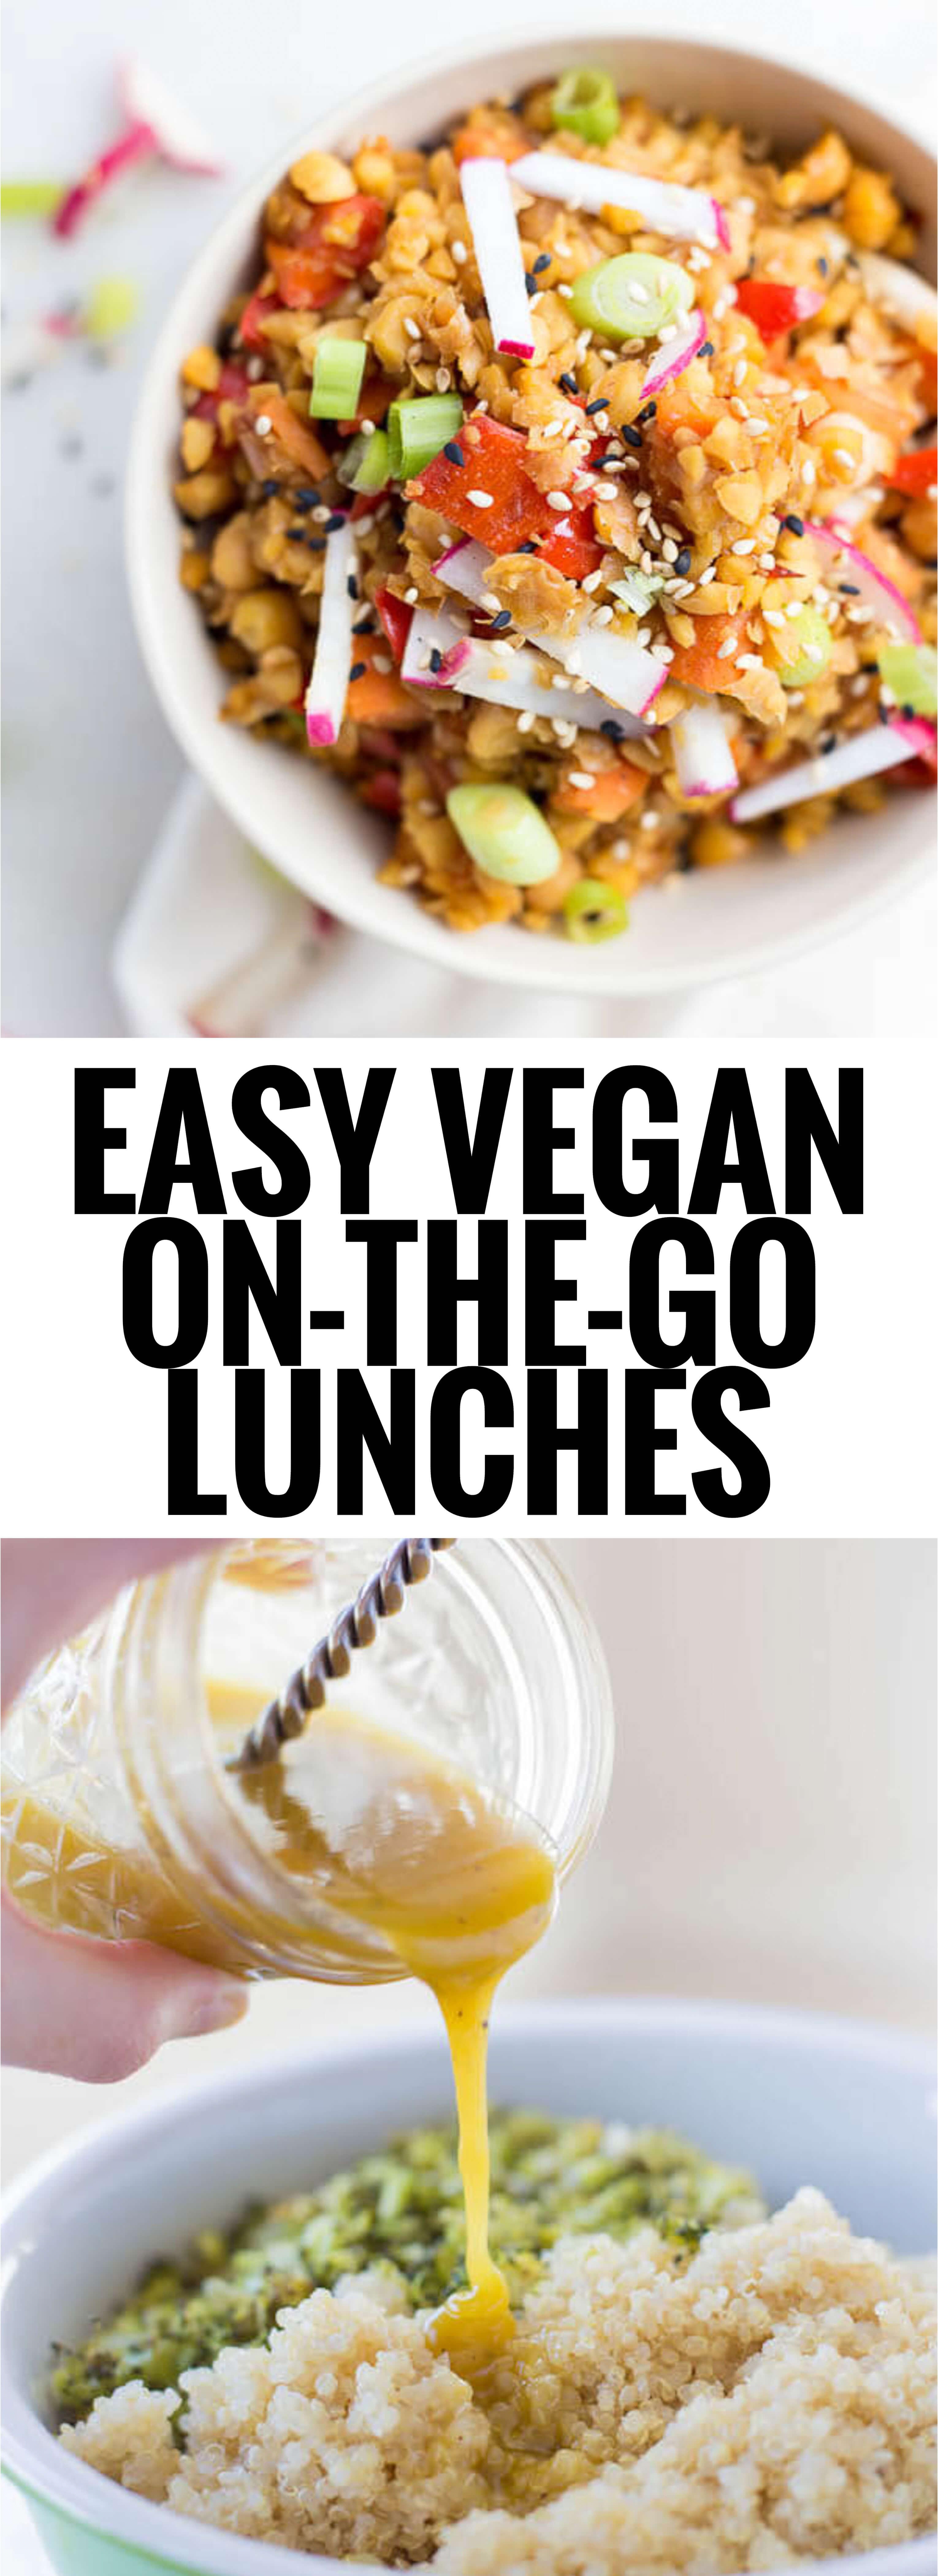 Vegan Recipes Easy  Easy Vegan the Go Lunches Fooduzzi